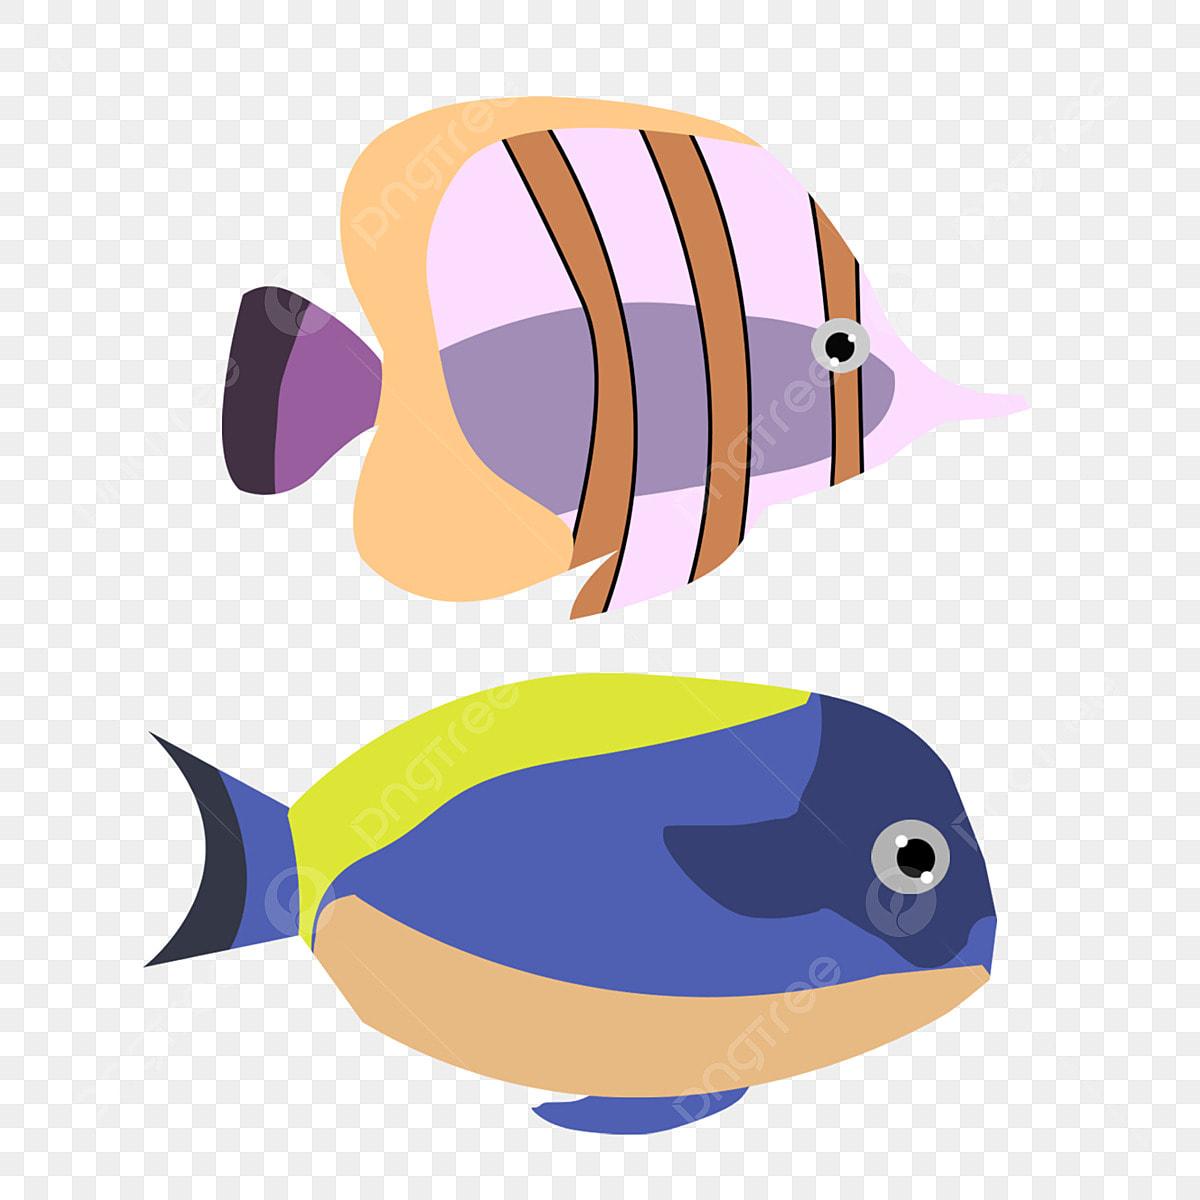 Ocean Biru Ikan Mudah Hidupan Laut Rumpai Laut Kartun Ikan Mudah